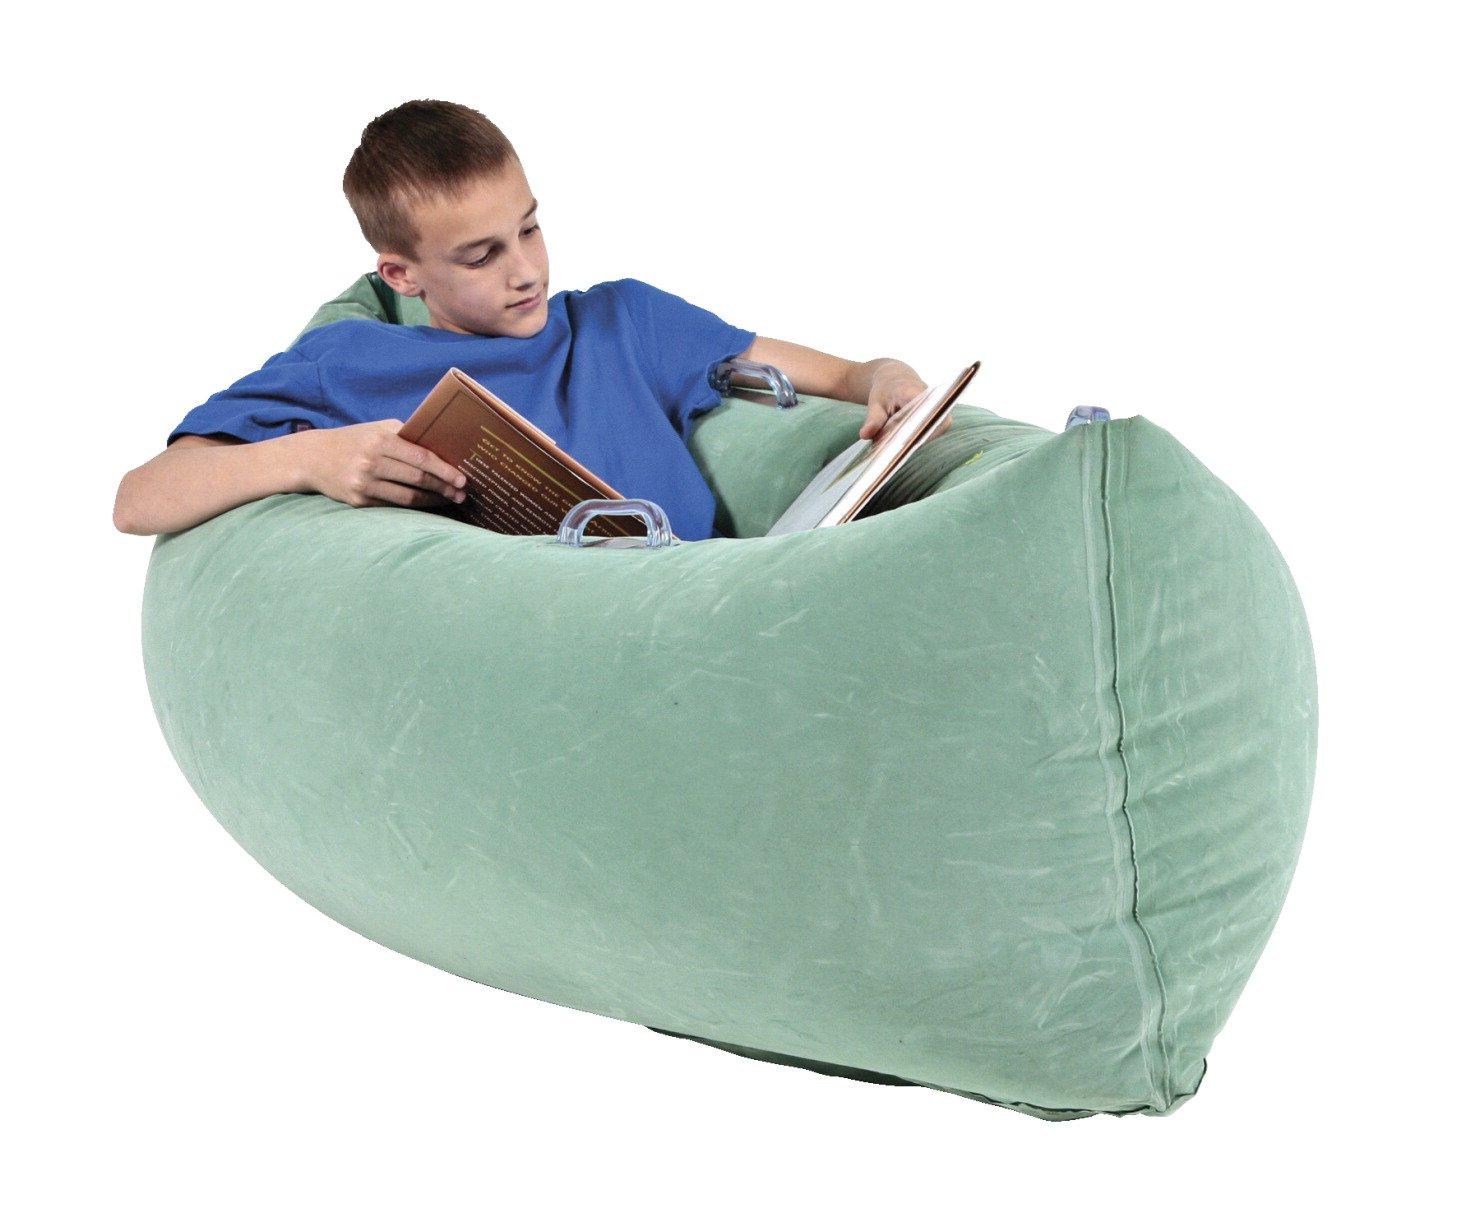 Abilitations Inflatable PeaPod Medium, 60 Inches, Vinyl, Green